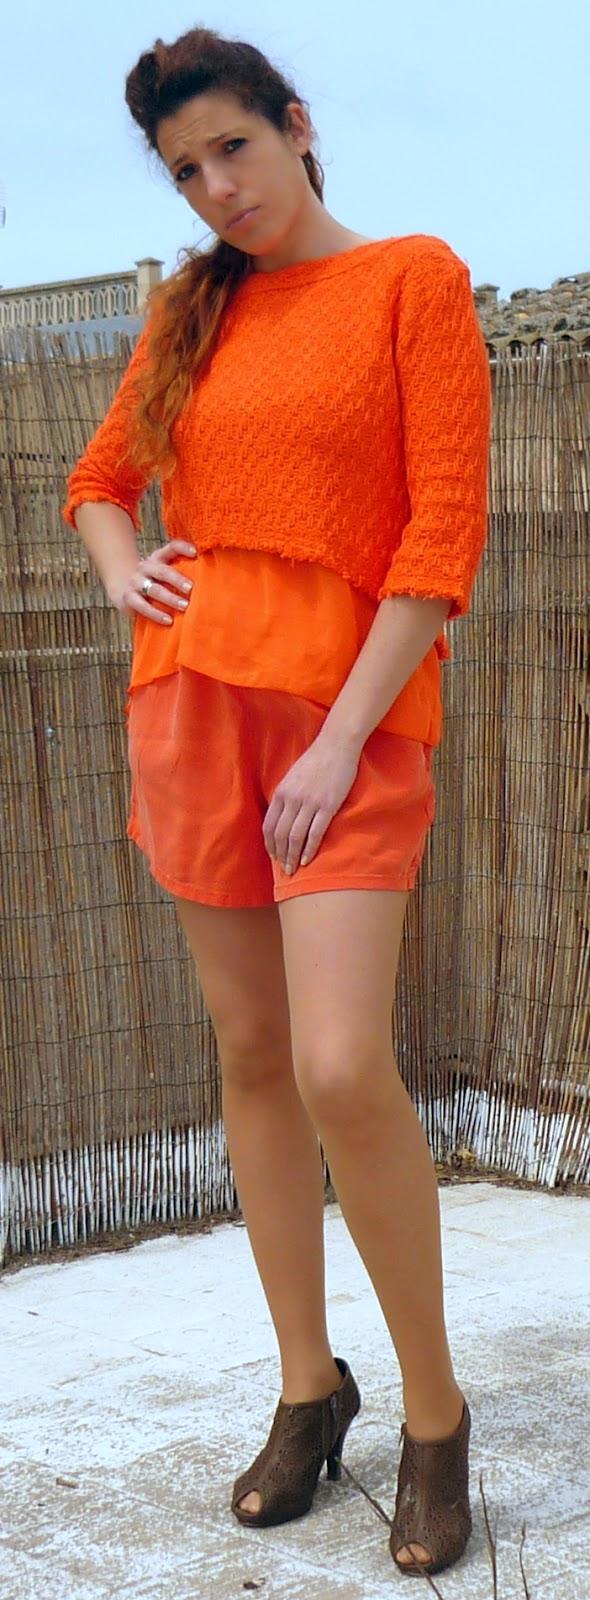 conjunto naranja